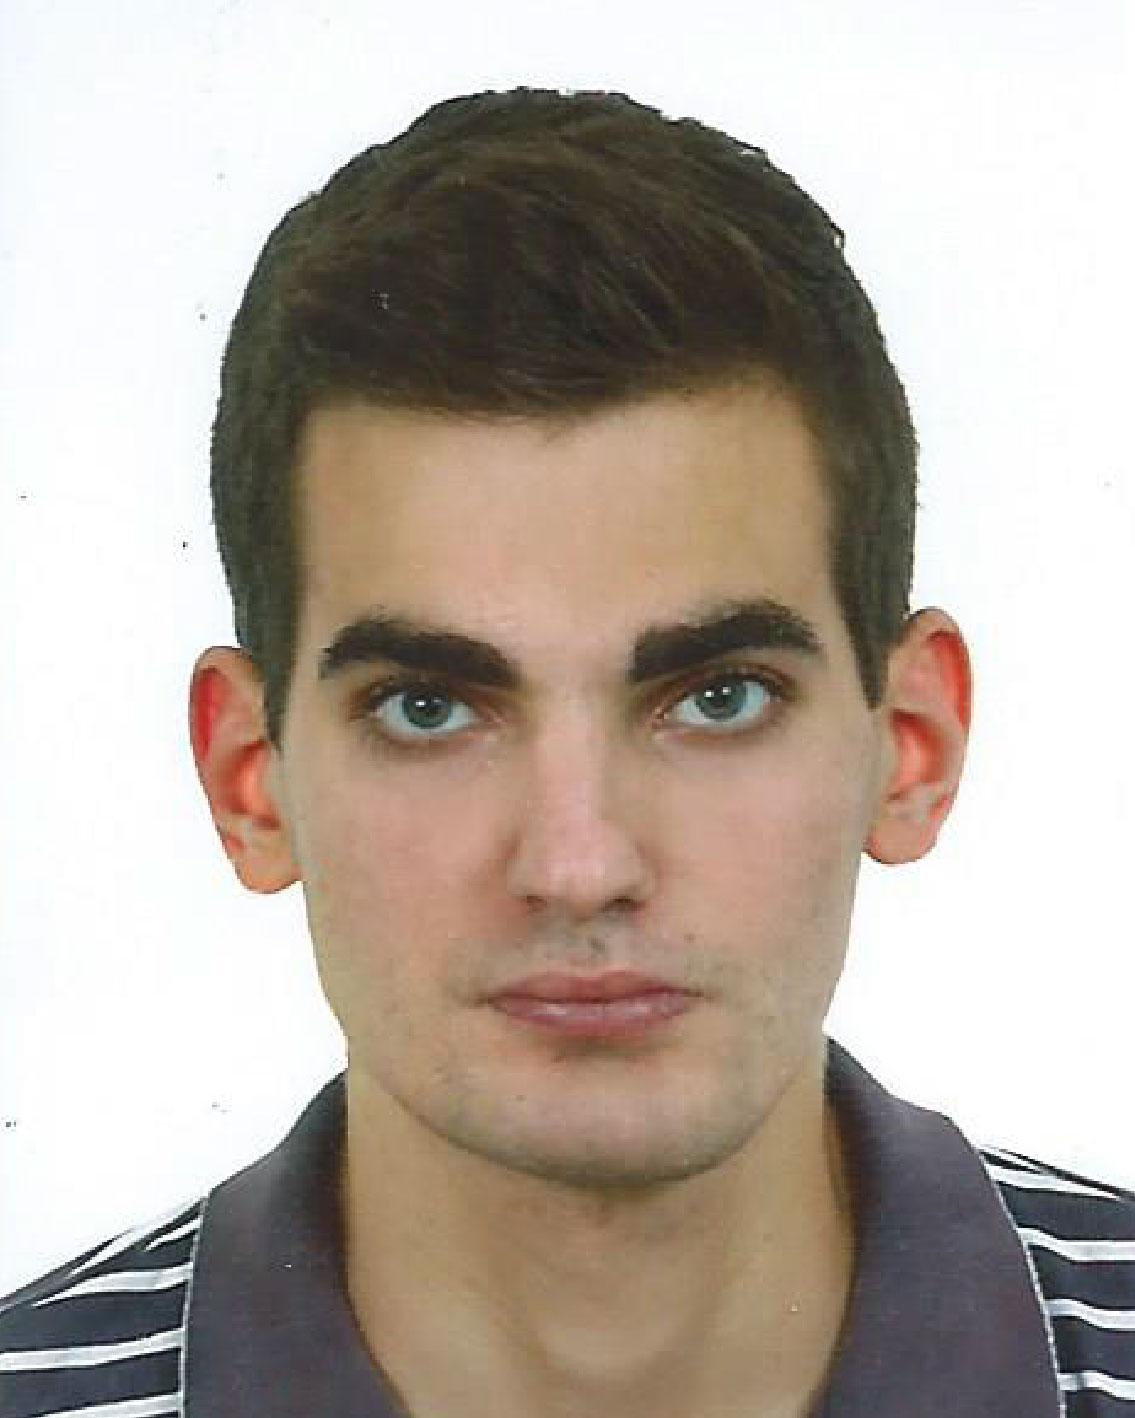 Emmanouil Daskalakis